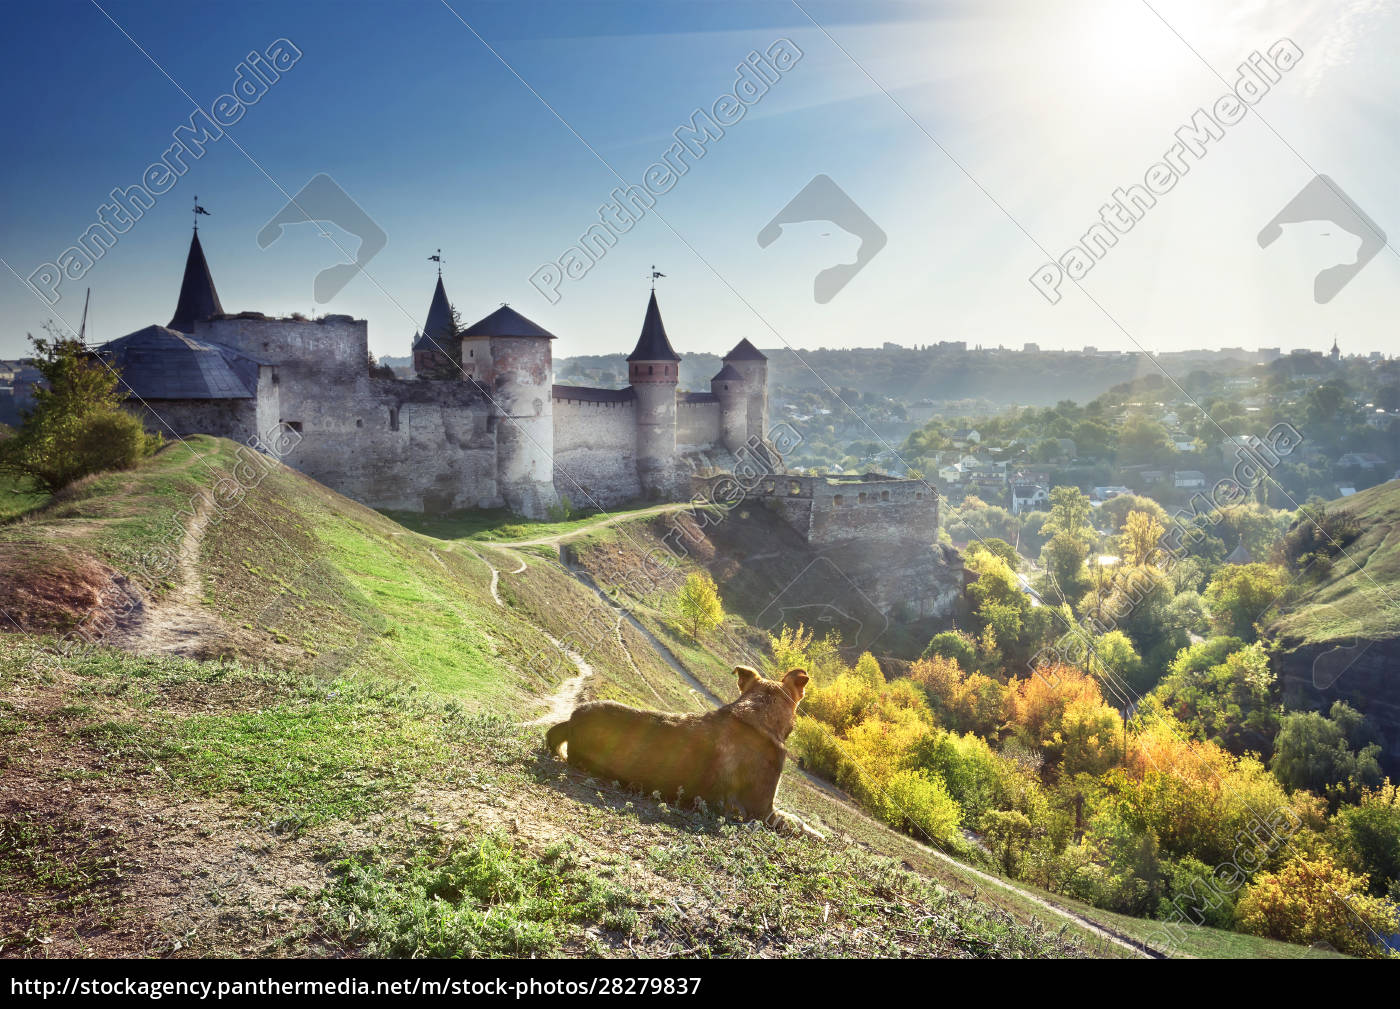 dog, guarding, fortress, on, slopes - 28279837